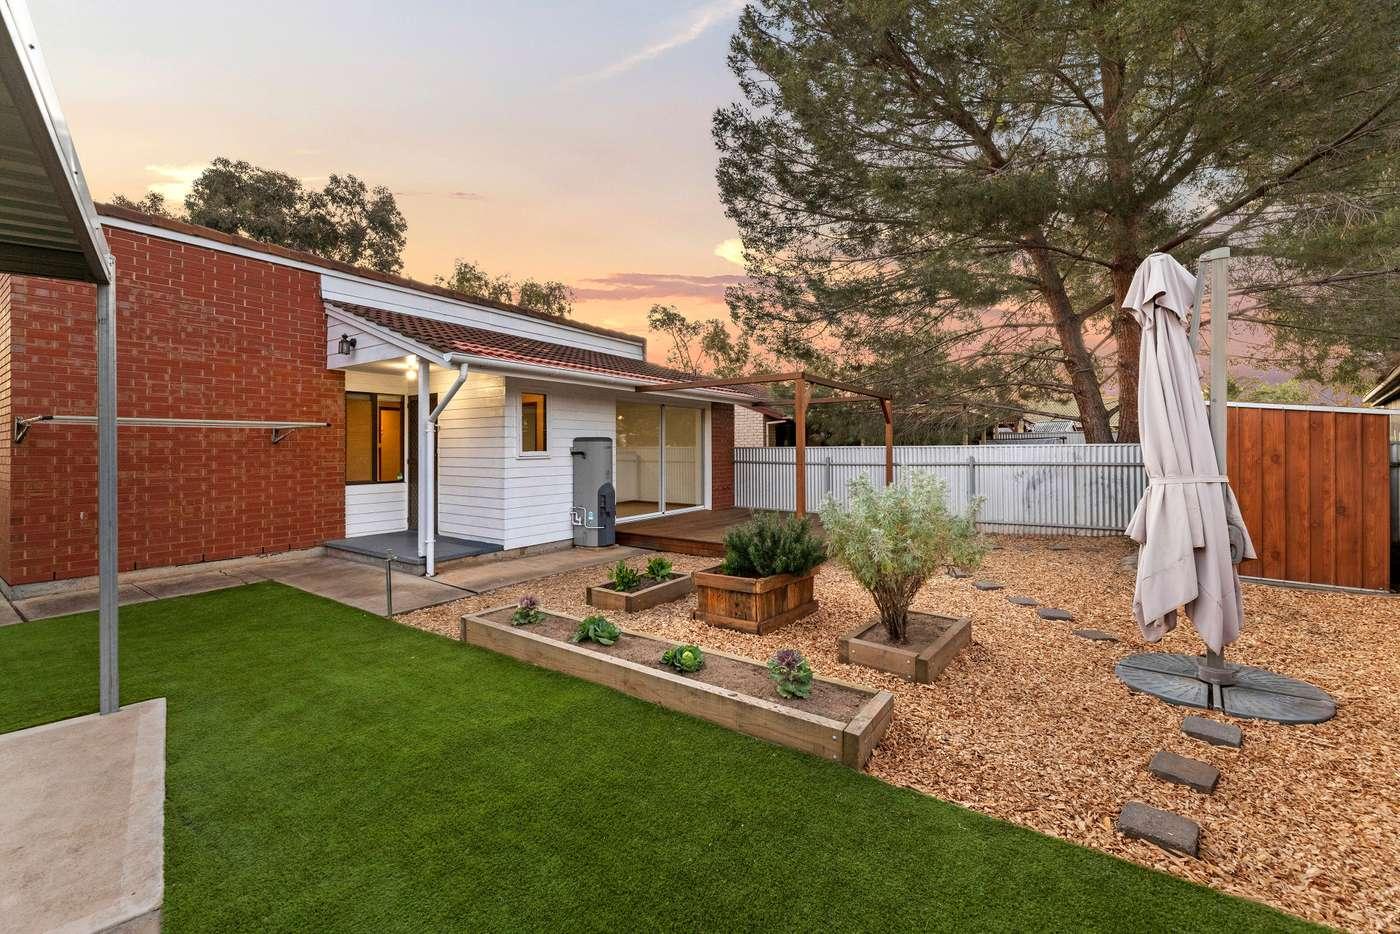 Main view of Homely house listing, 48 Verbena Drive, Parafield Gardens SA 5107